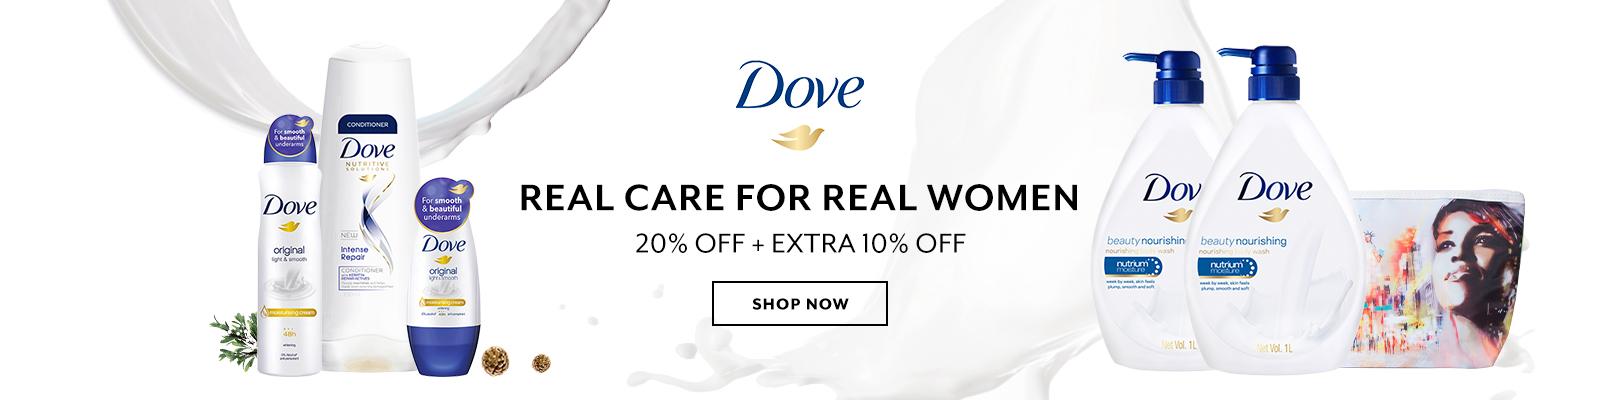 XMAS2018 Paid - Dove